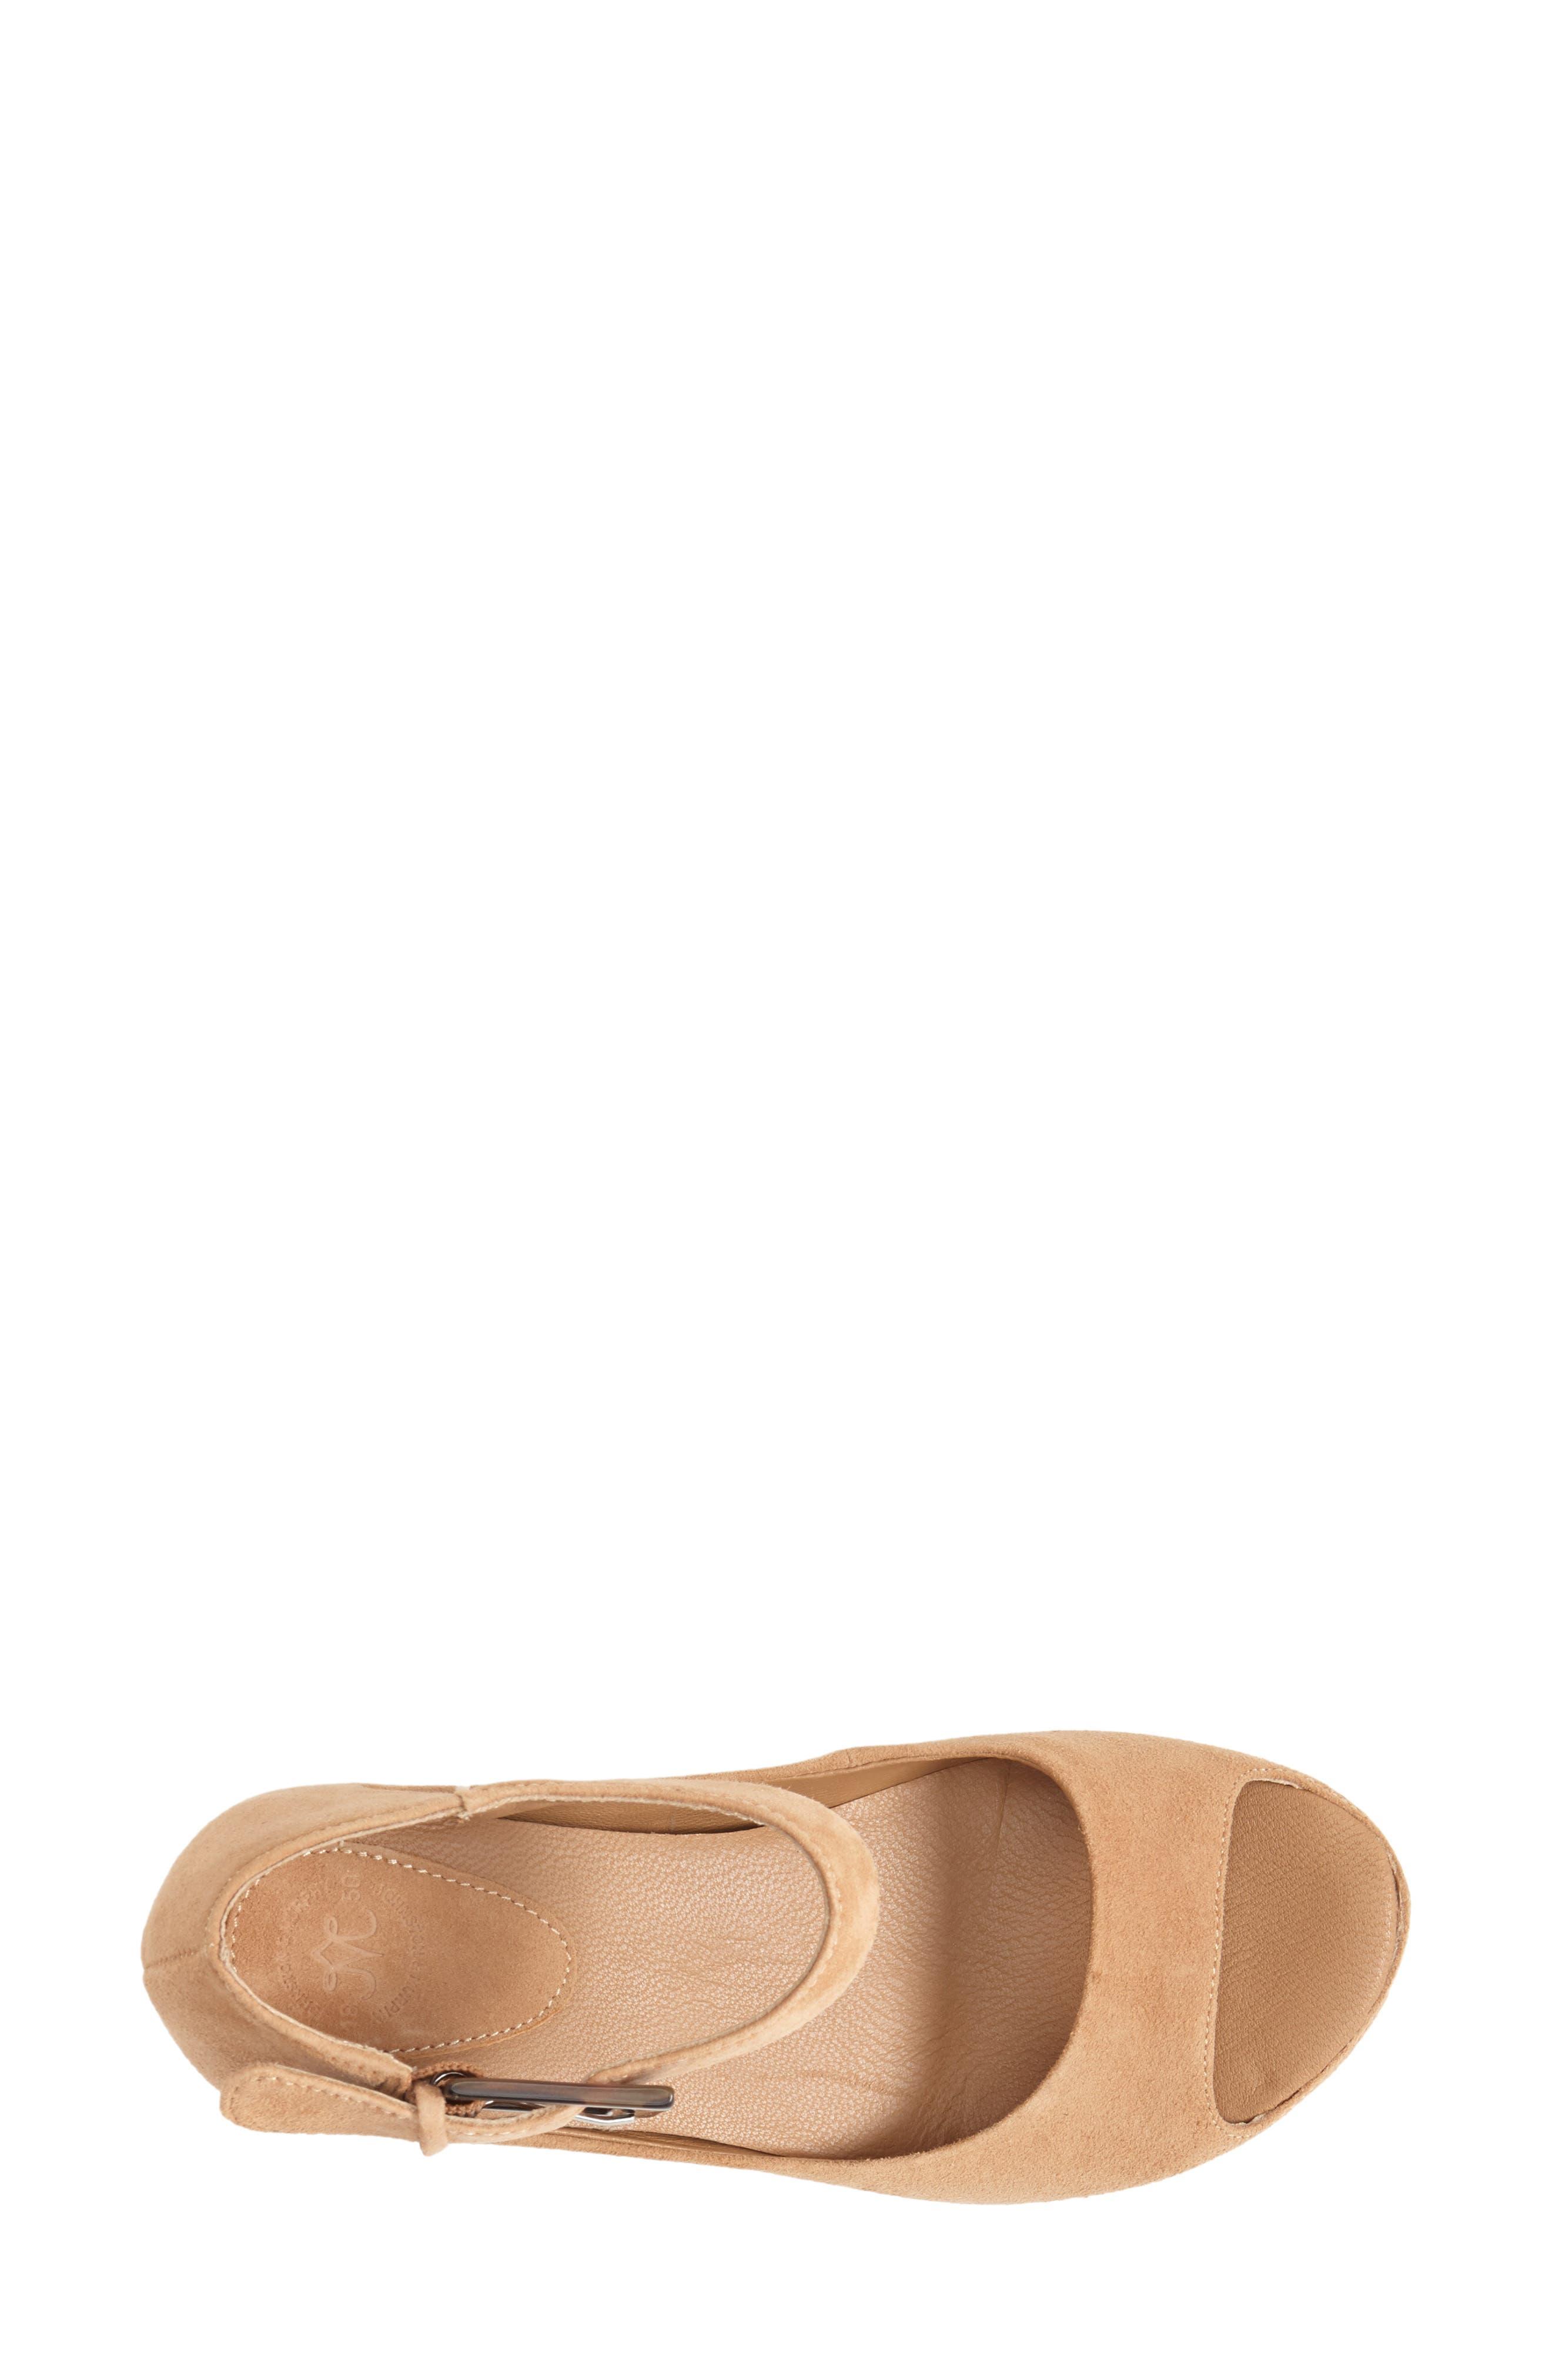 'Tricia' Ankle Strap Sandal,                             Alternate thumbnail 47, color,